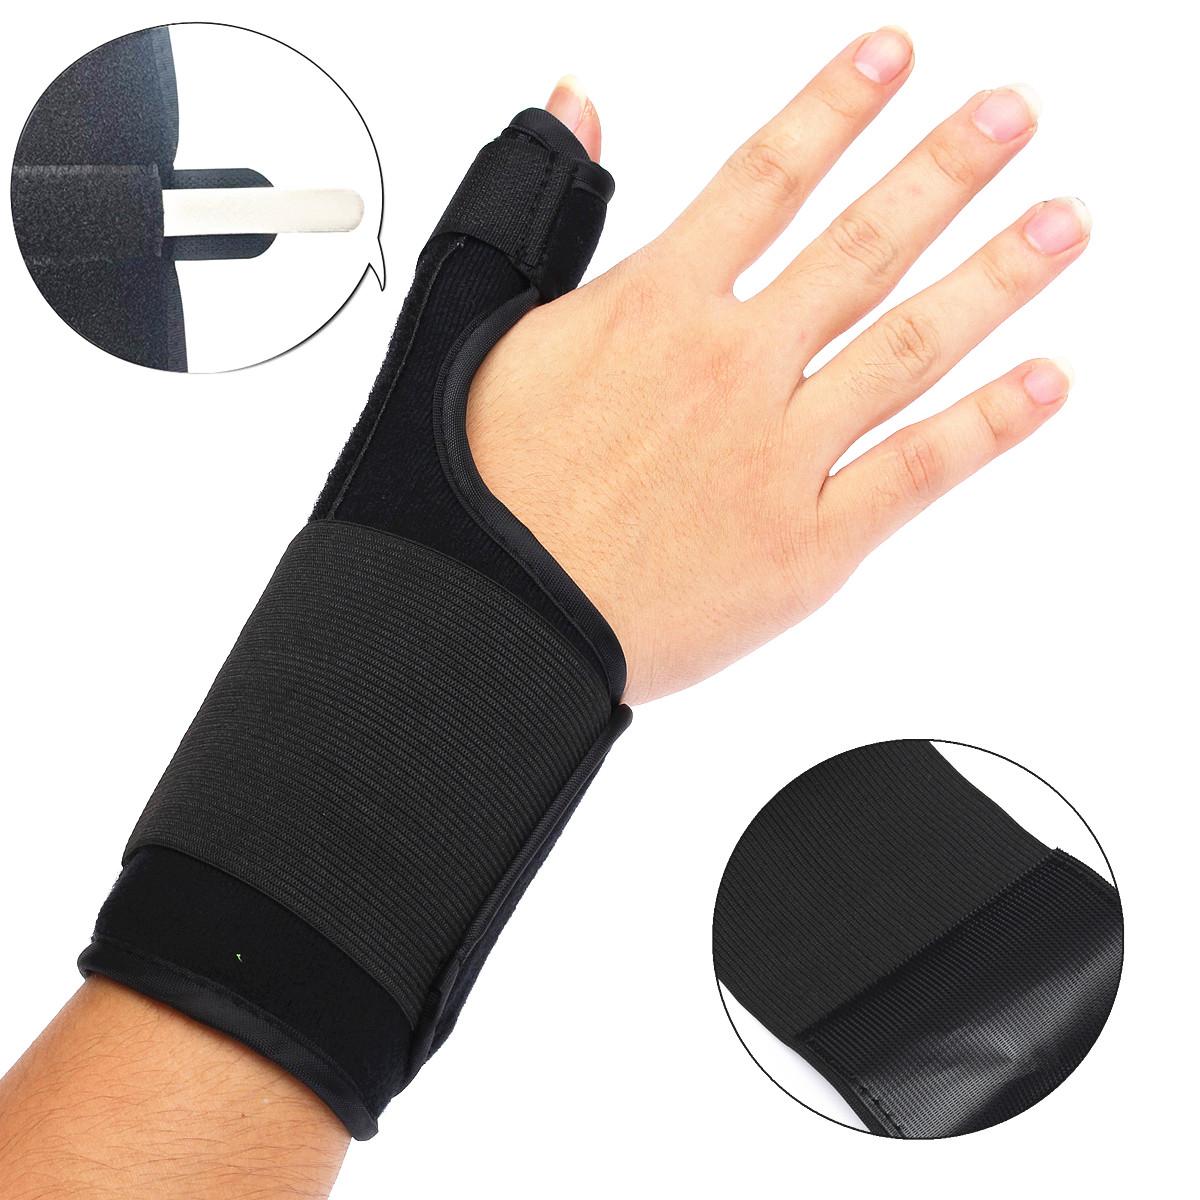 Strains ORTONYX Kids Thumb Immobilizer Brace Thumb Spica Support Splint- Pain Wrist Strap Left and Right Hand // ACJB2303 Carpal Tunnel /& Trigger Thumb Stabilizer Sprains